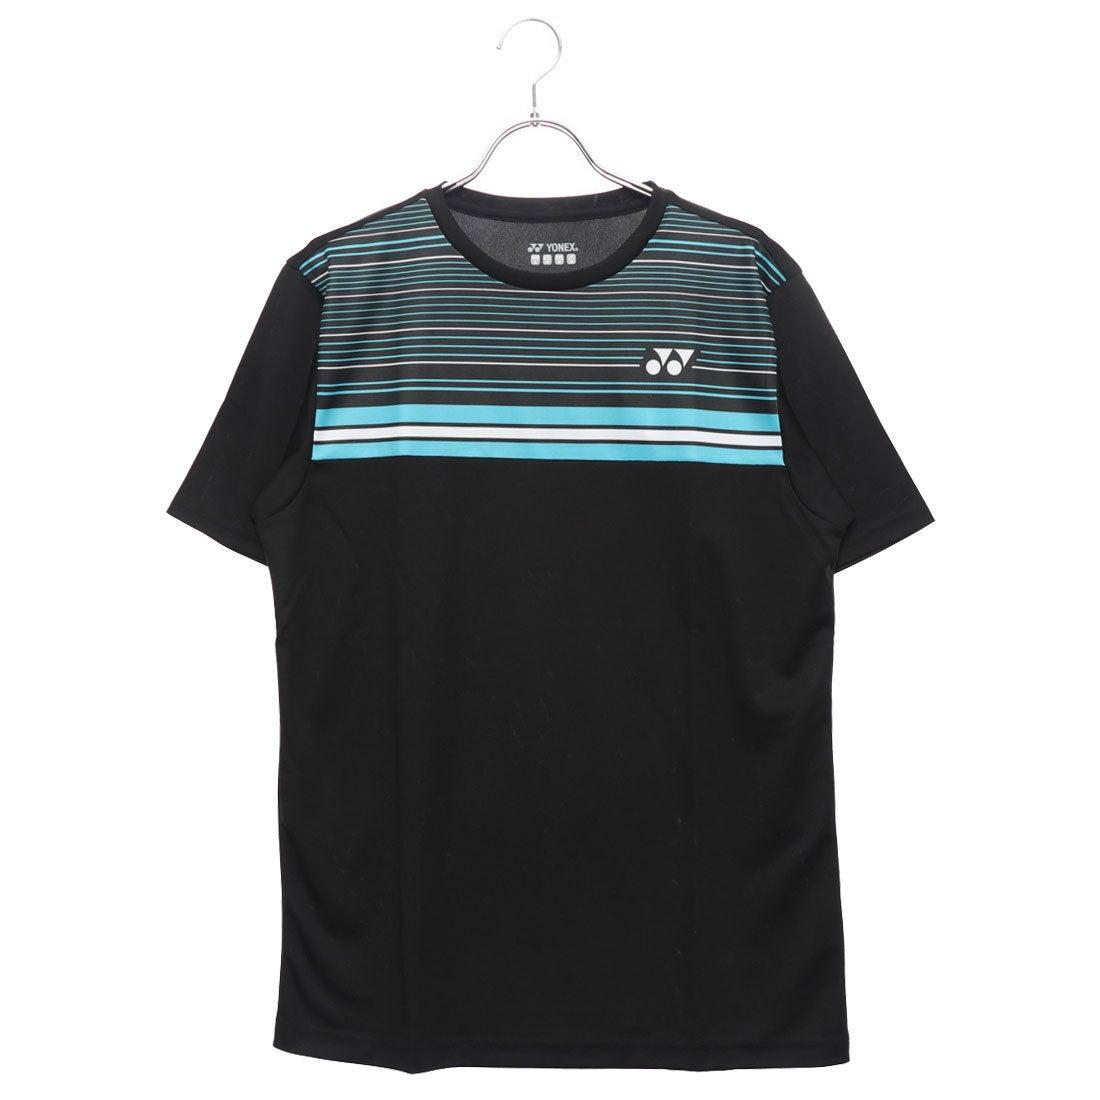 805d095dd2e71 ヨネックス YONEX テニス 半袖Tシャツ ドライTシャツ 16347 -レディースファッション通販 ロコンドガールズコレクション (ロココレ)